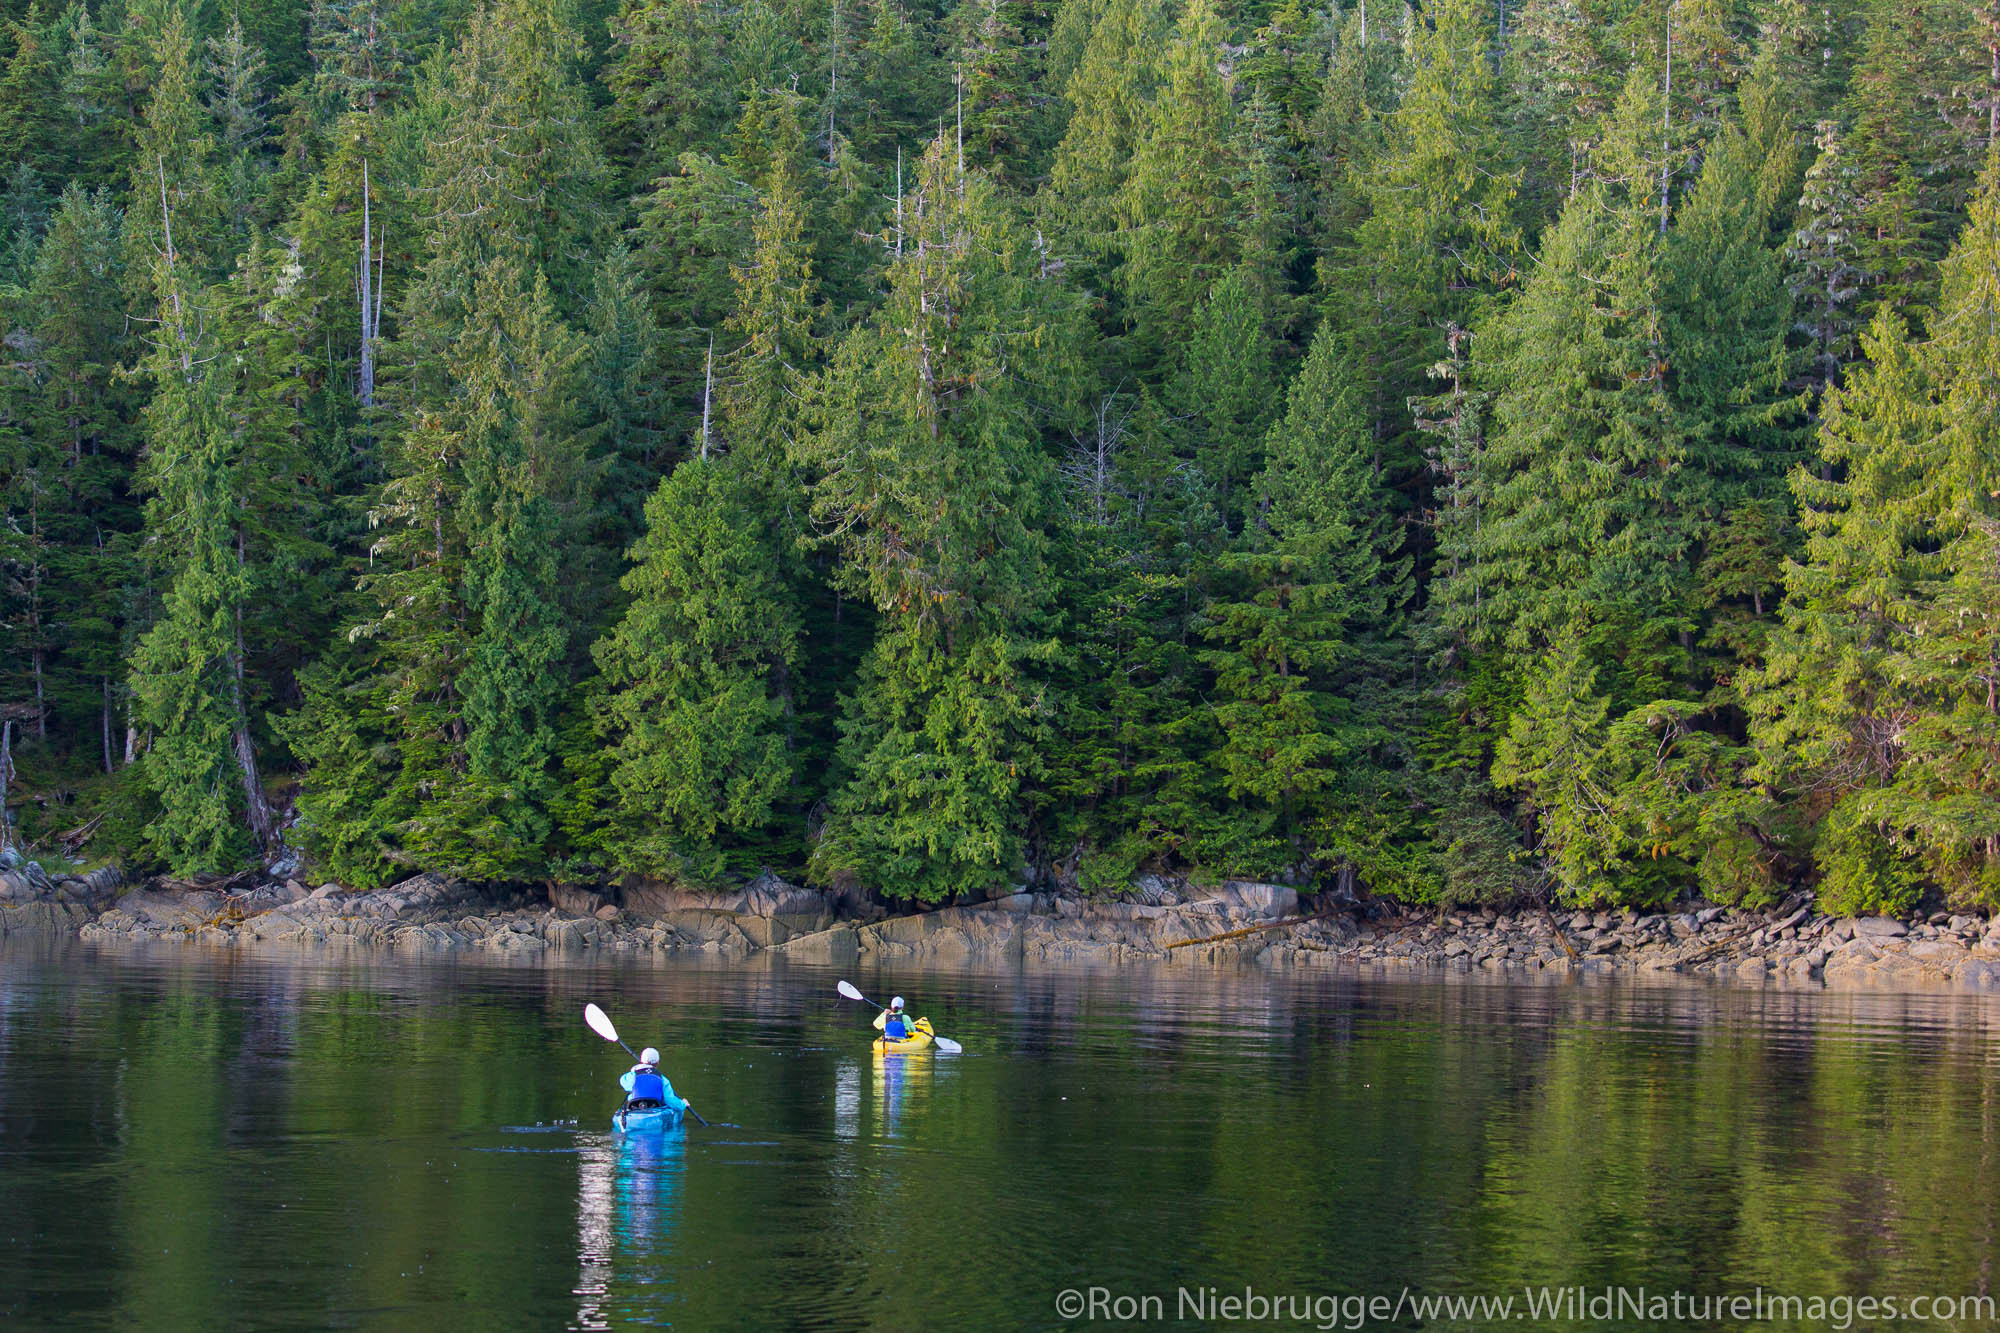 Kayaking in Tongass National Forest, Alaska.